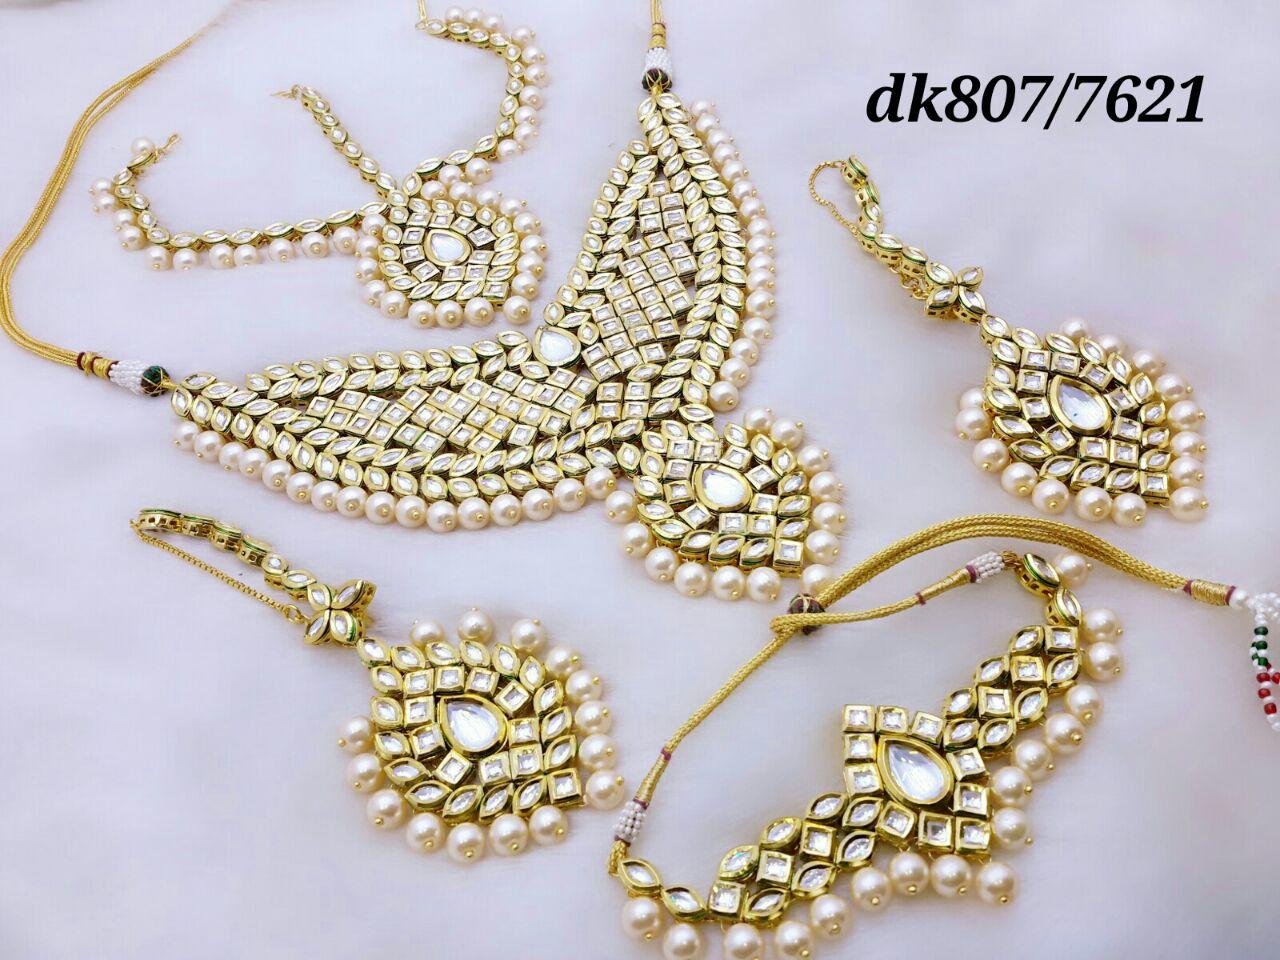 Imitation Jewellery Wholesalers In Malad East Imitation Jewelry